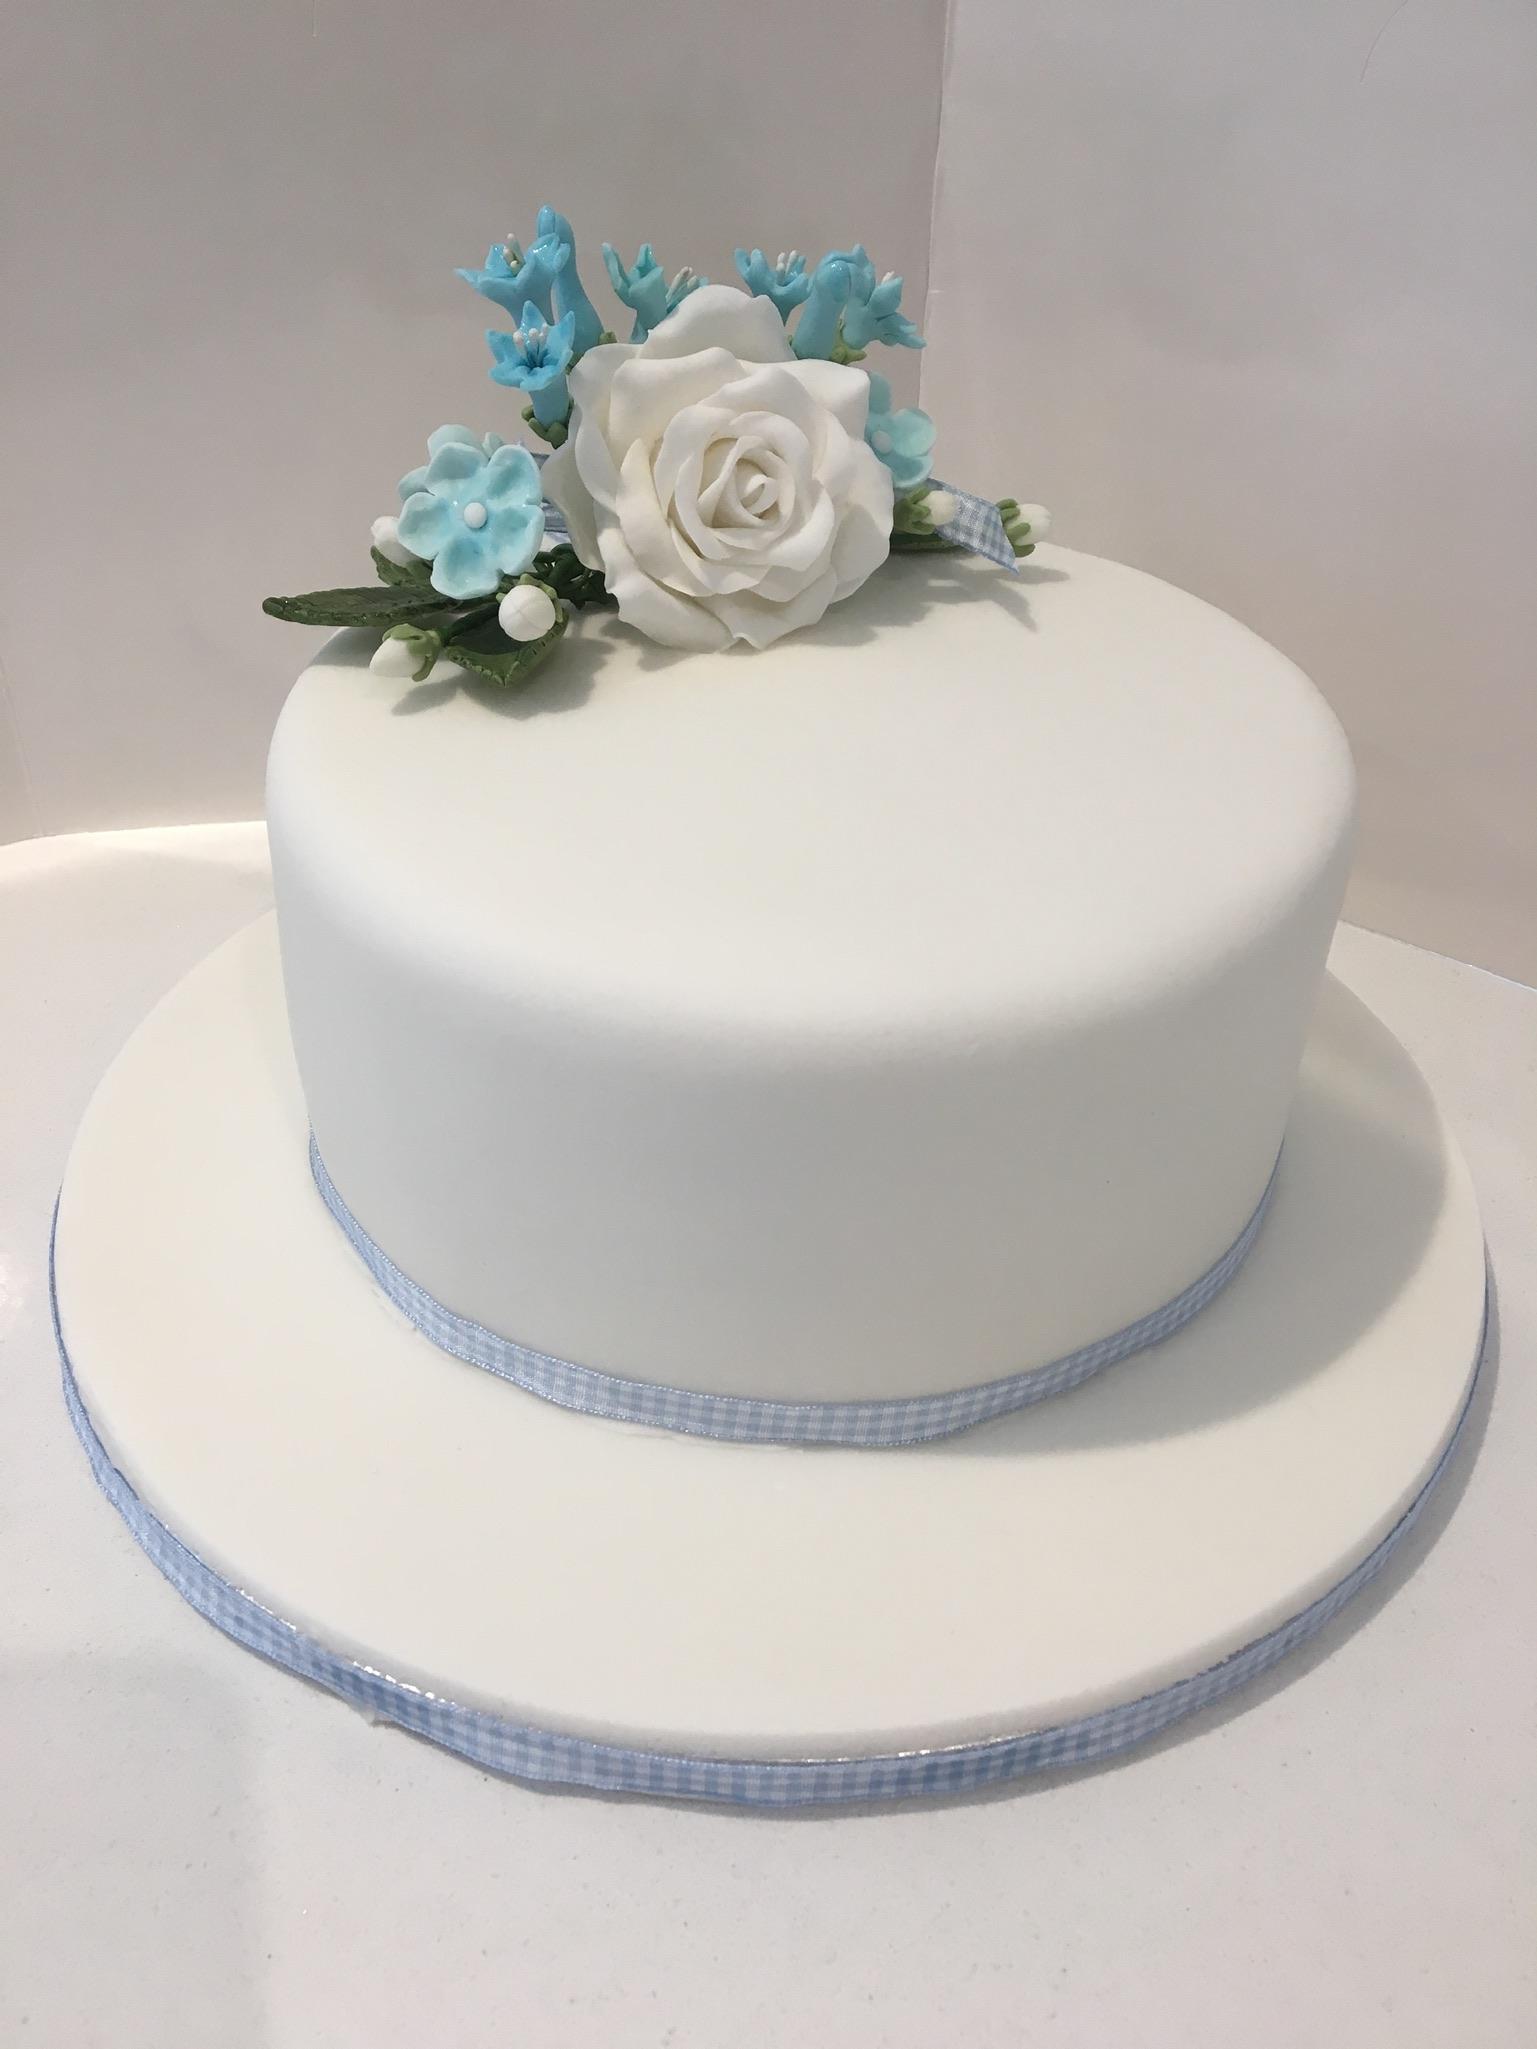 Blue floral birthday cake